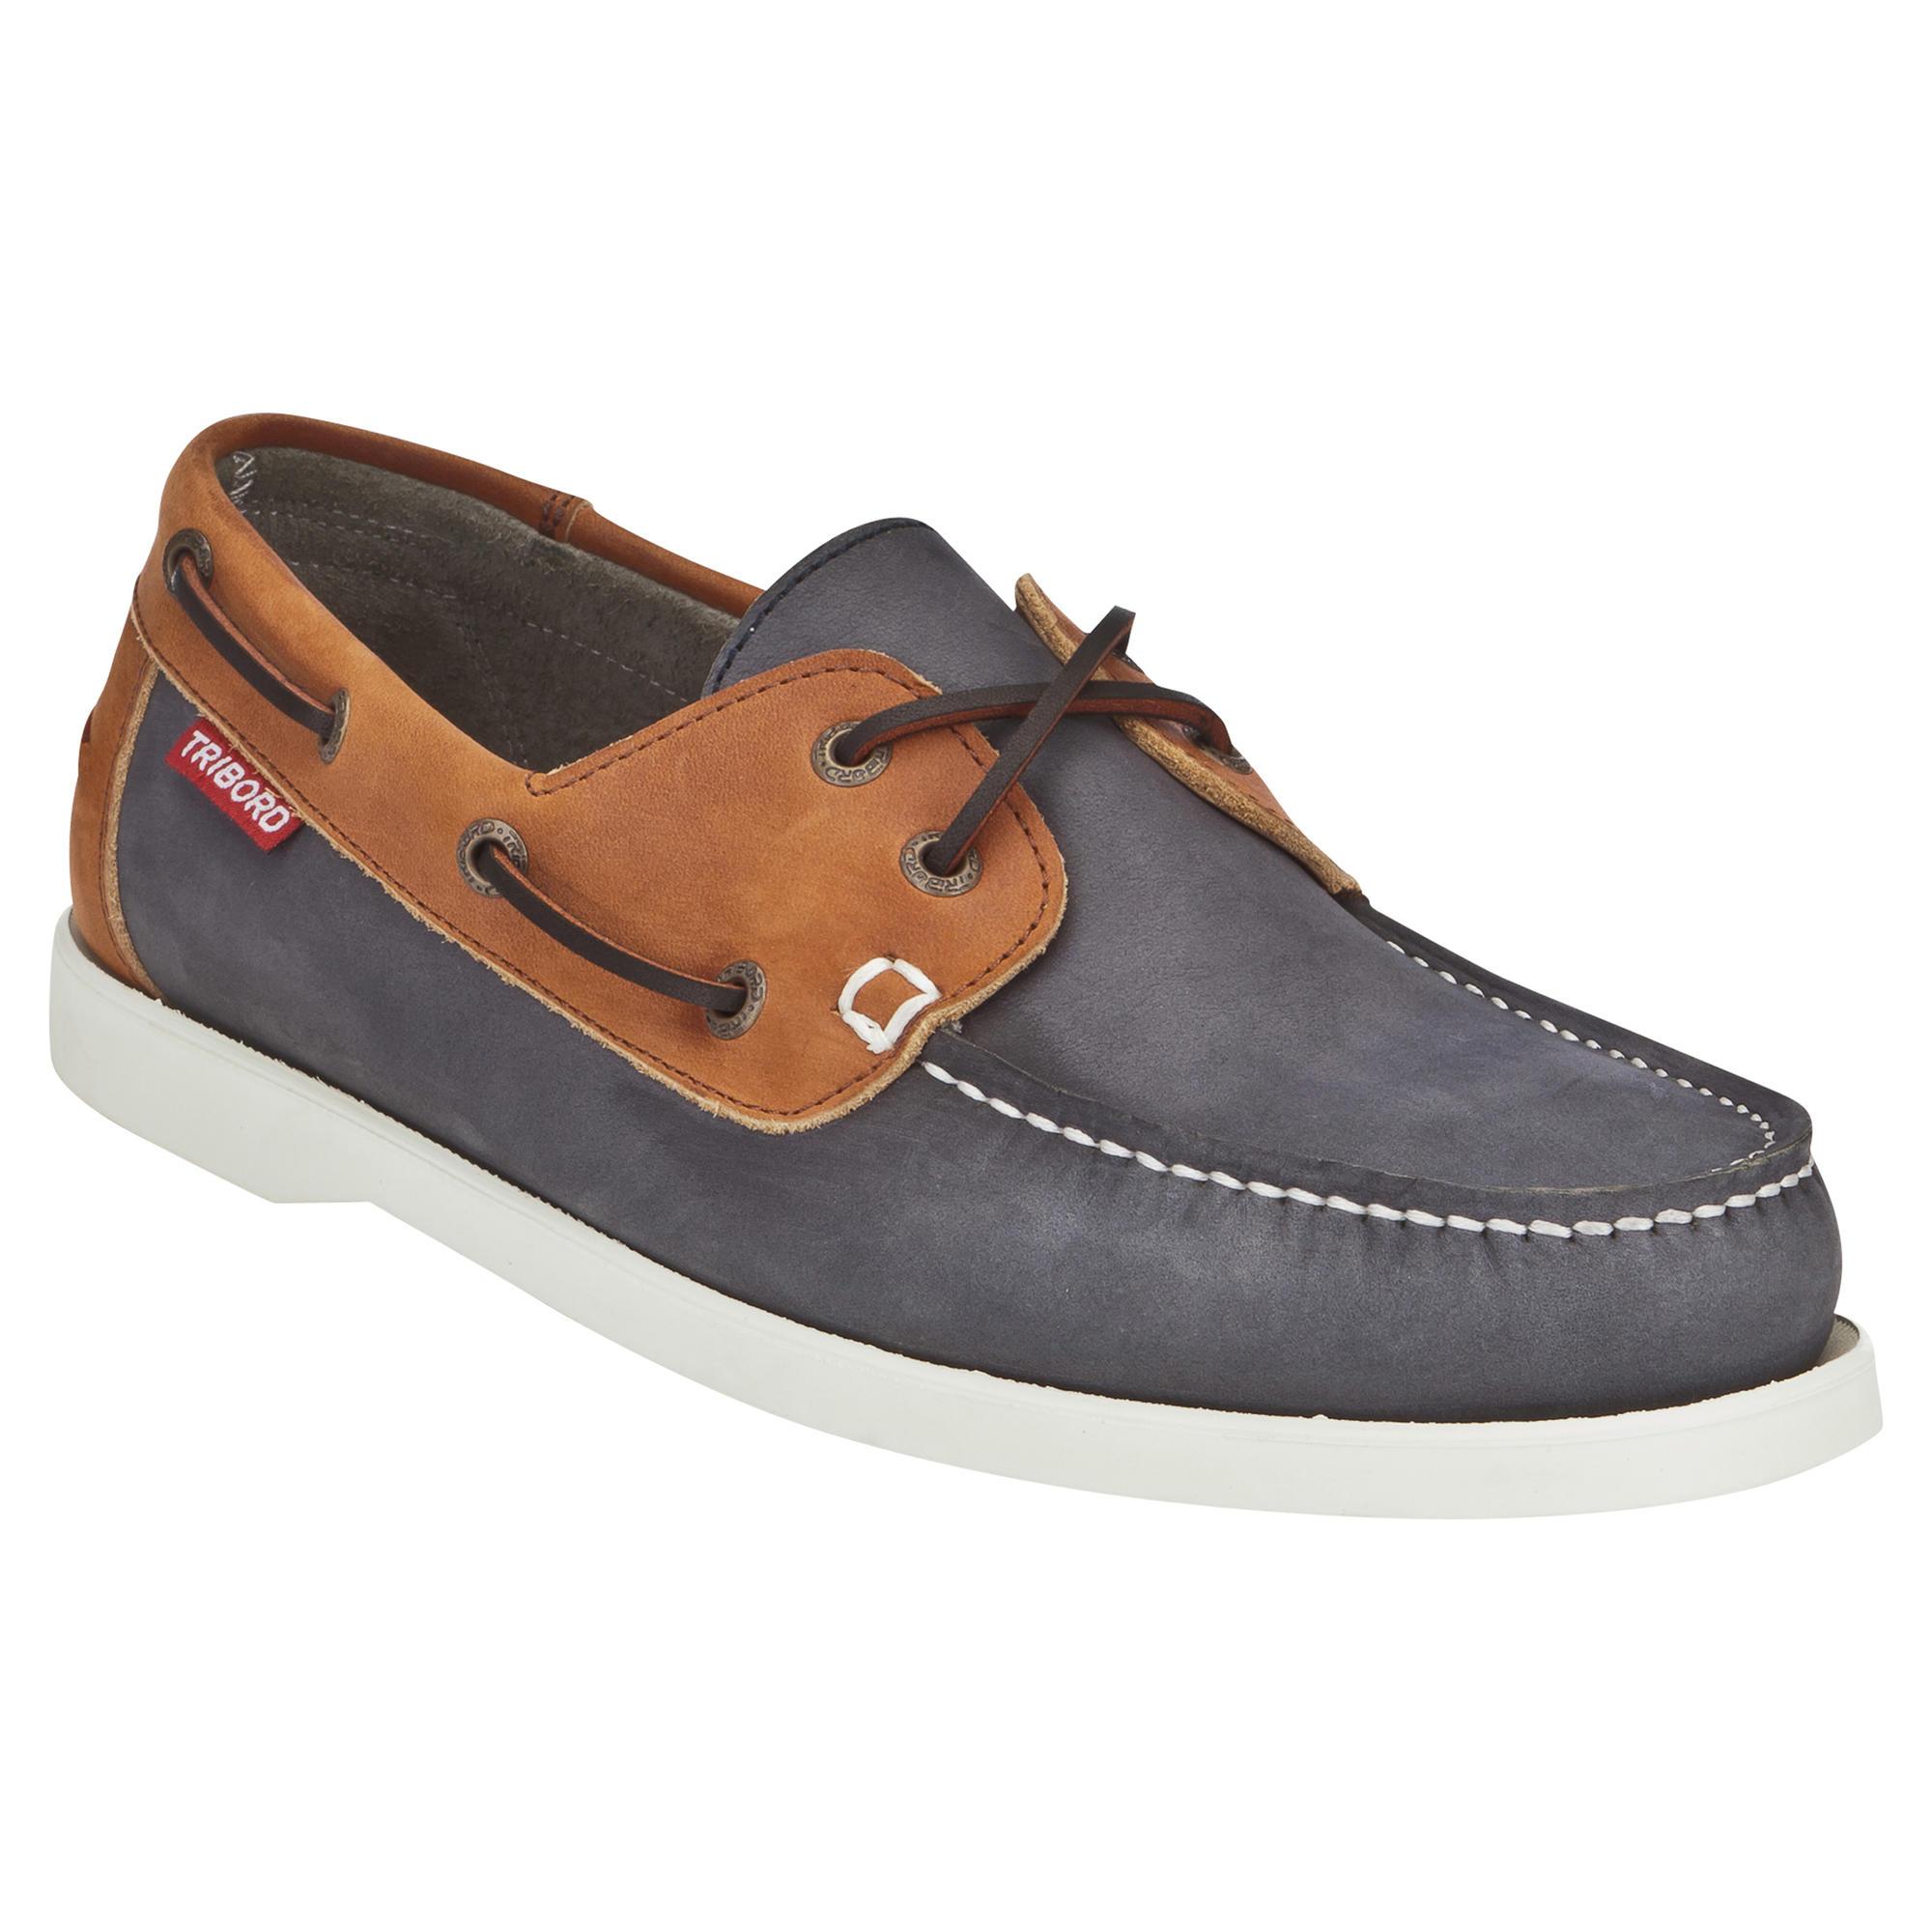 Chaussures bateau cuir homme cr500 bleu marron tribord - Chaussure de securite homme decathlon ...